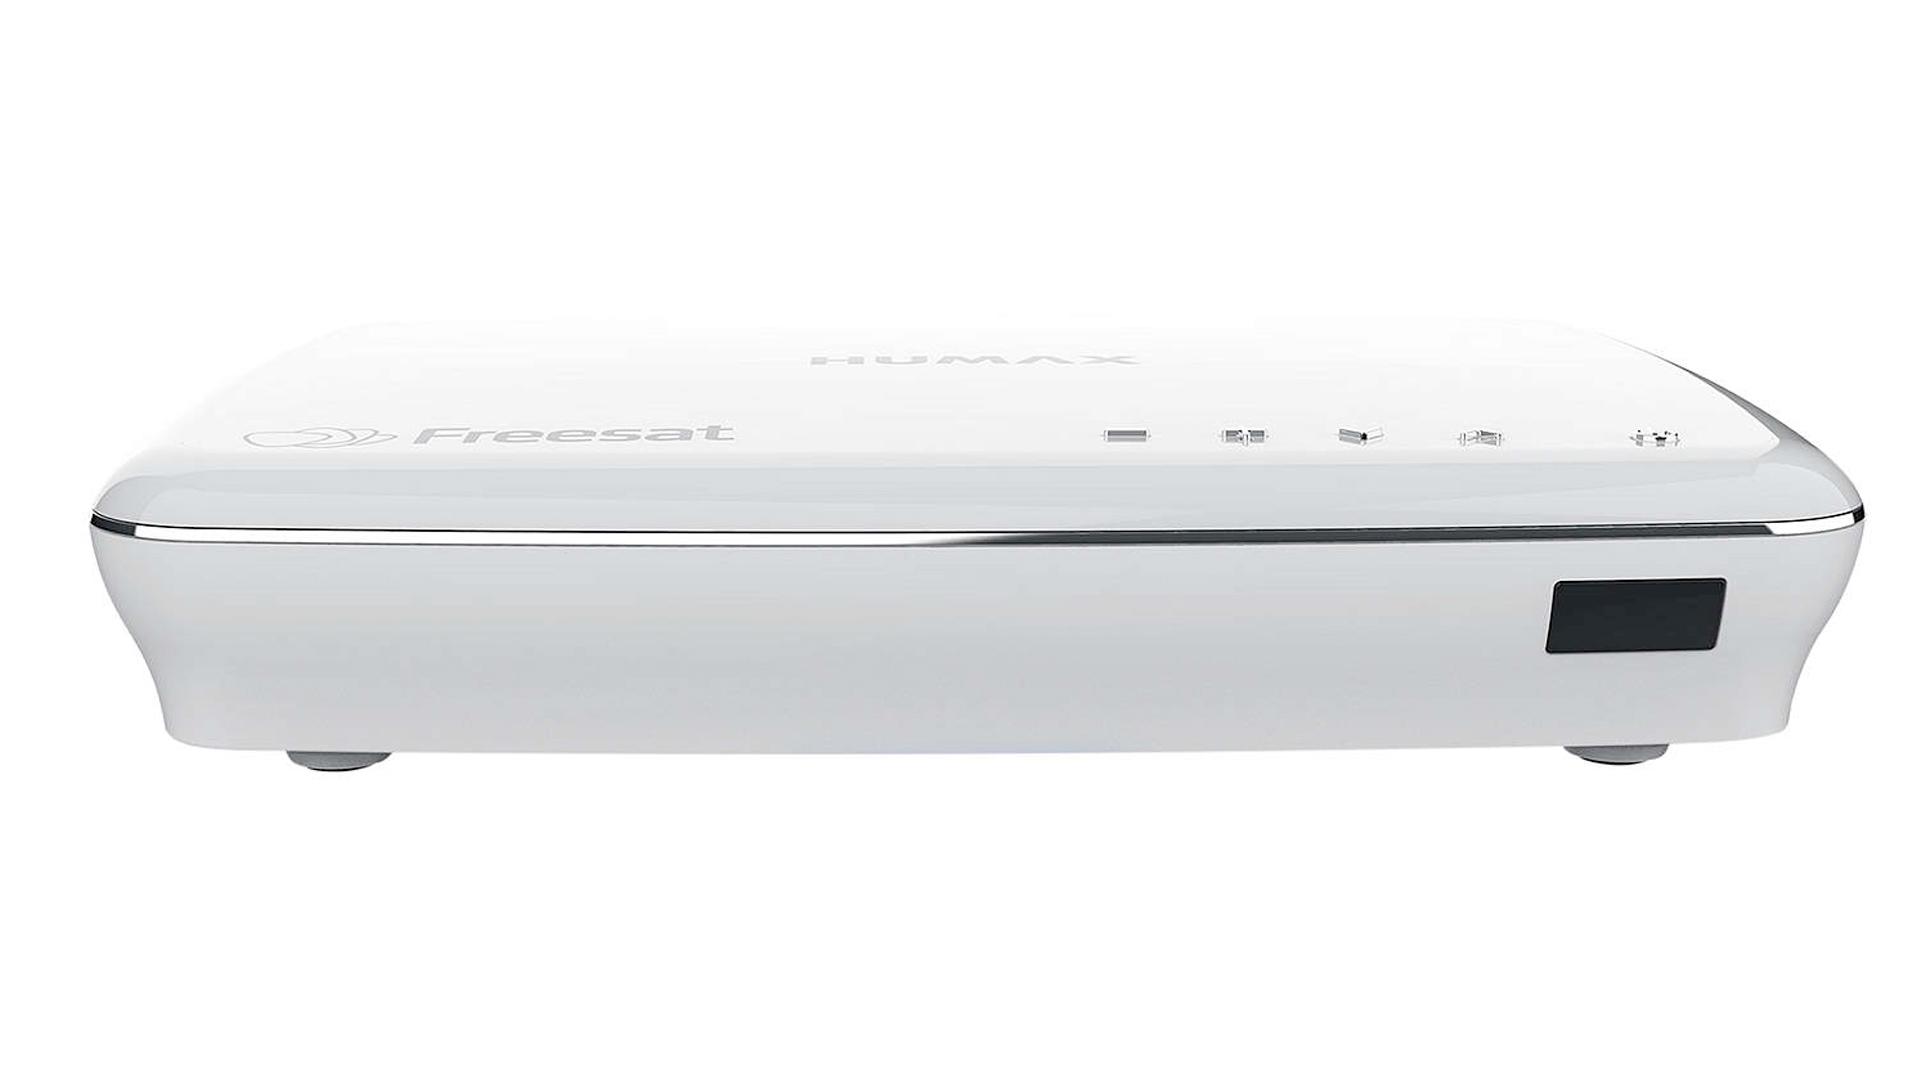 Humax HDR-1100S